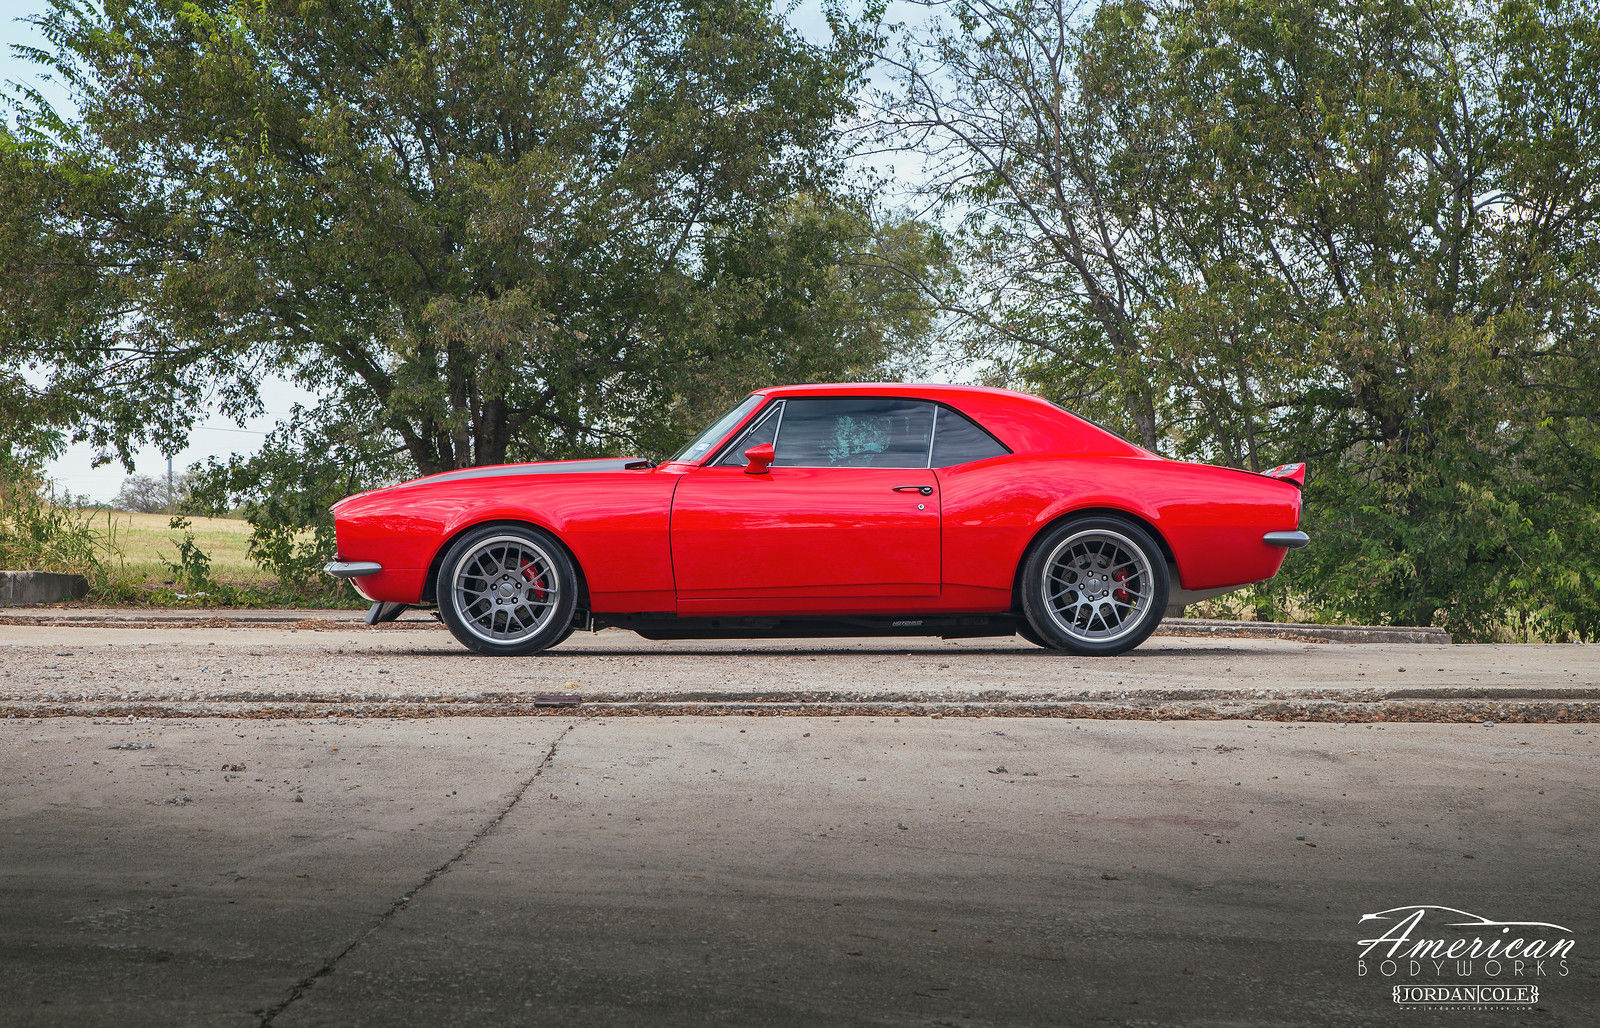 1967 Chevrolet Camaro | American Body Works Camaro on Forgeline DE3C Wheels